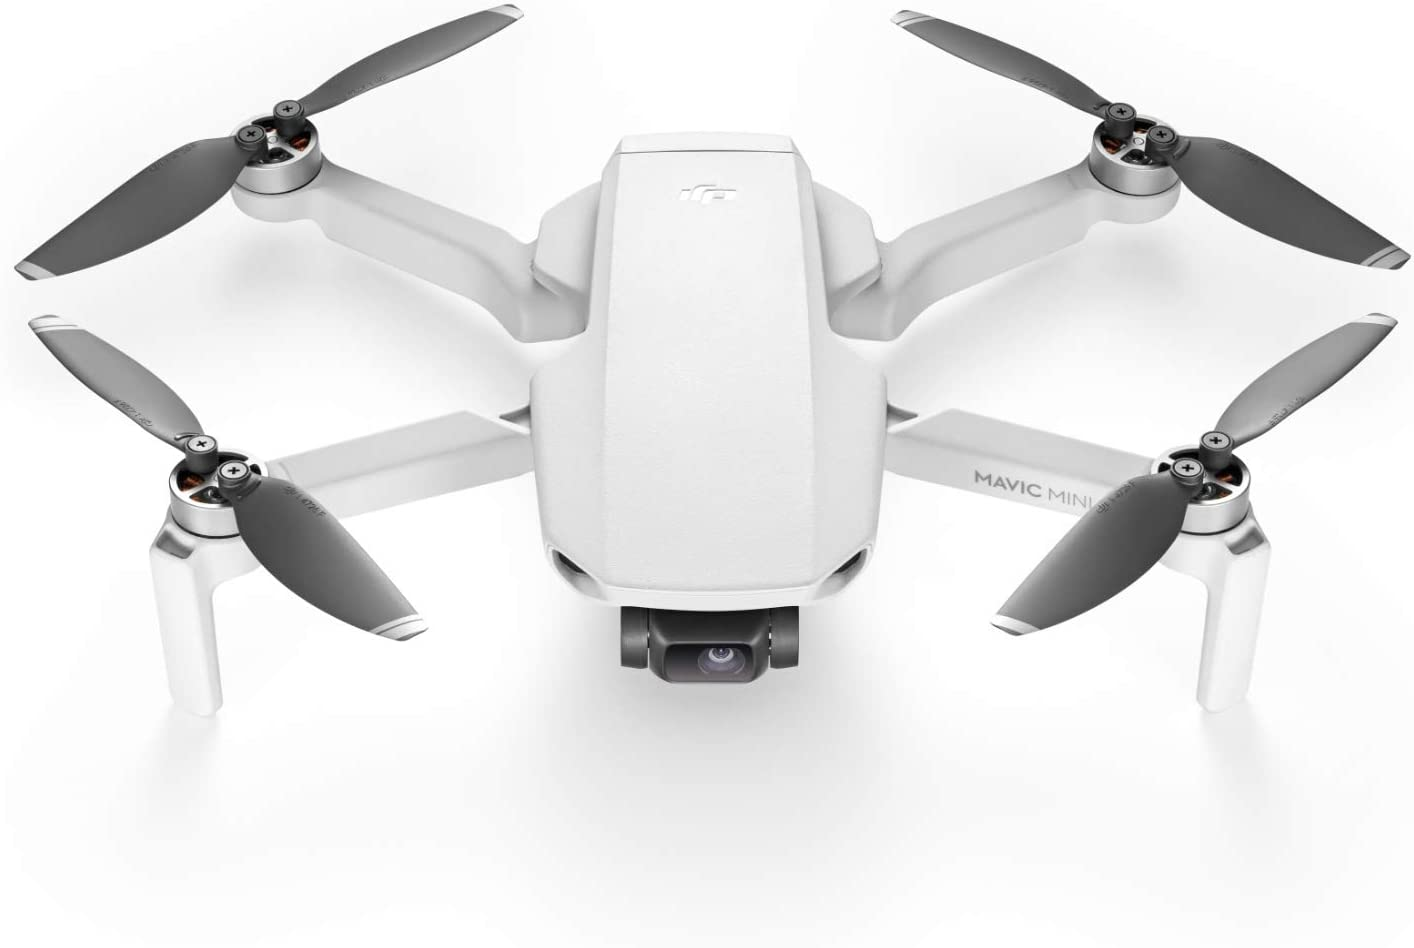 The Best Travel Photography Gear: What's In My Camera Bag | DJI Mavic Mini Pro Drone | DJI Mavic Mini Combo - Drone FlyCam Quadcopter UAV with 2.7K Camera 3-Axis Gimbal GPS 30min Flight Time, less than 0.55lbs, Gray